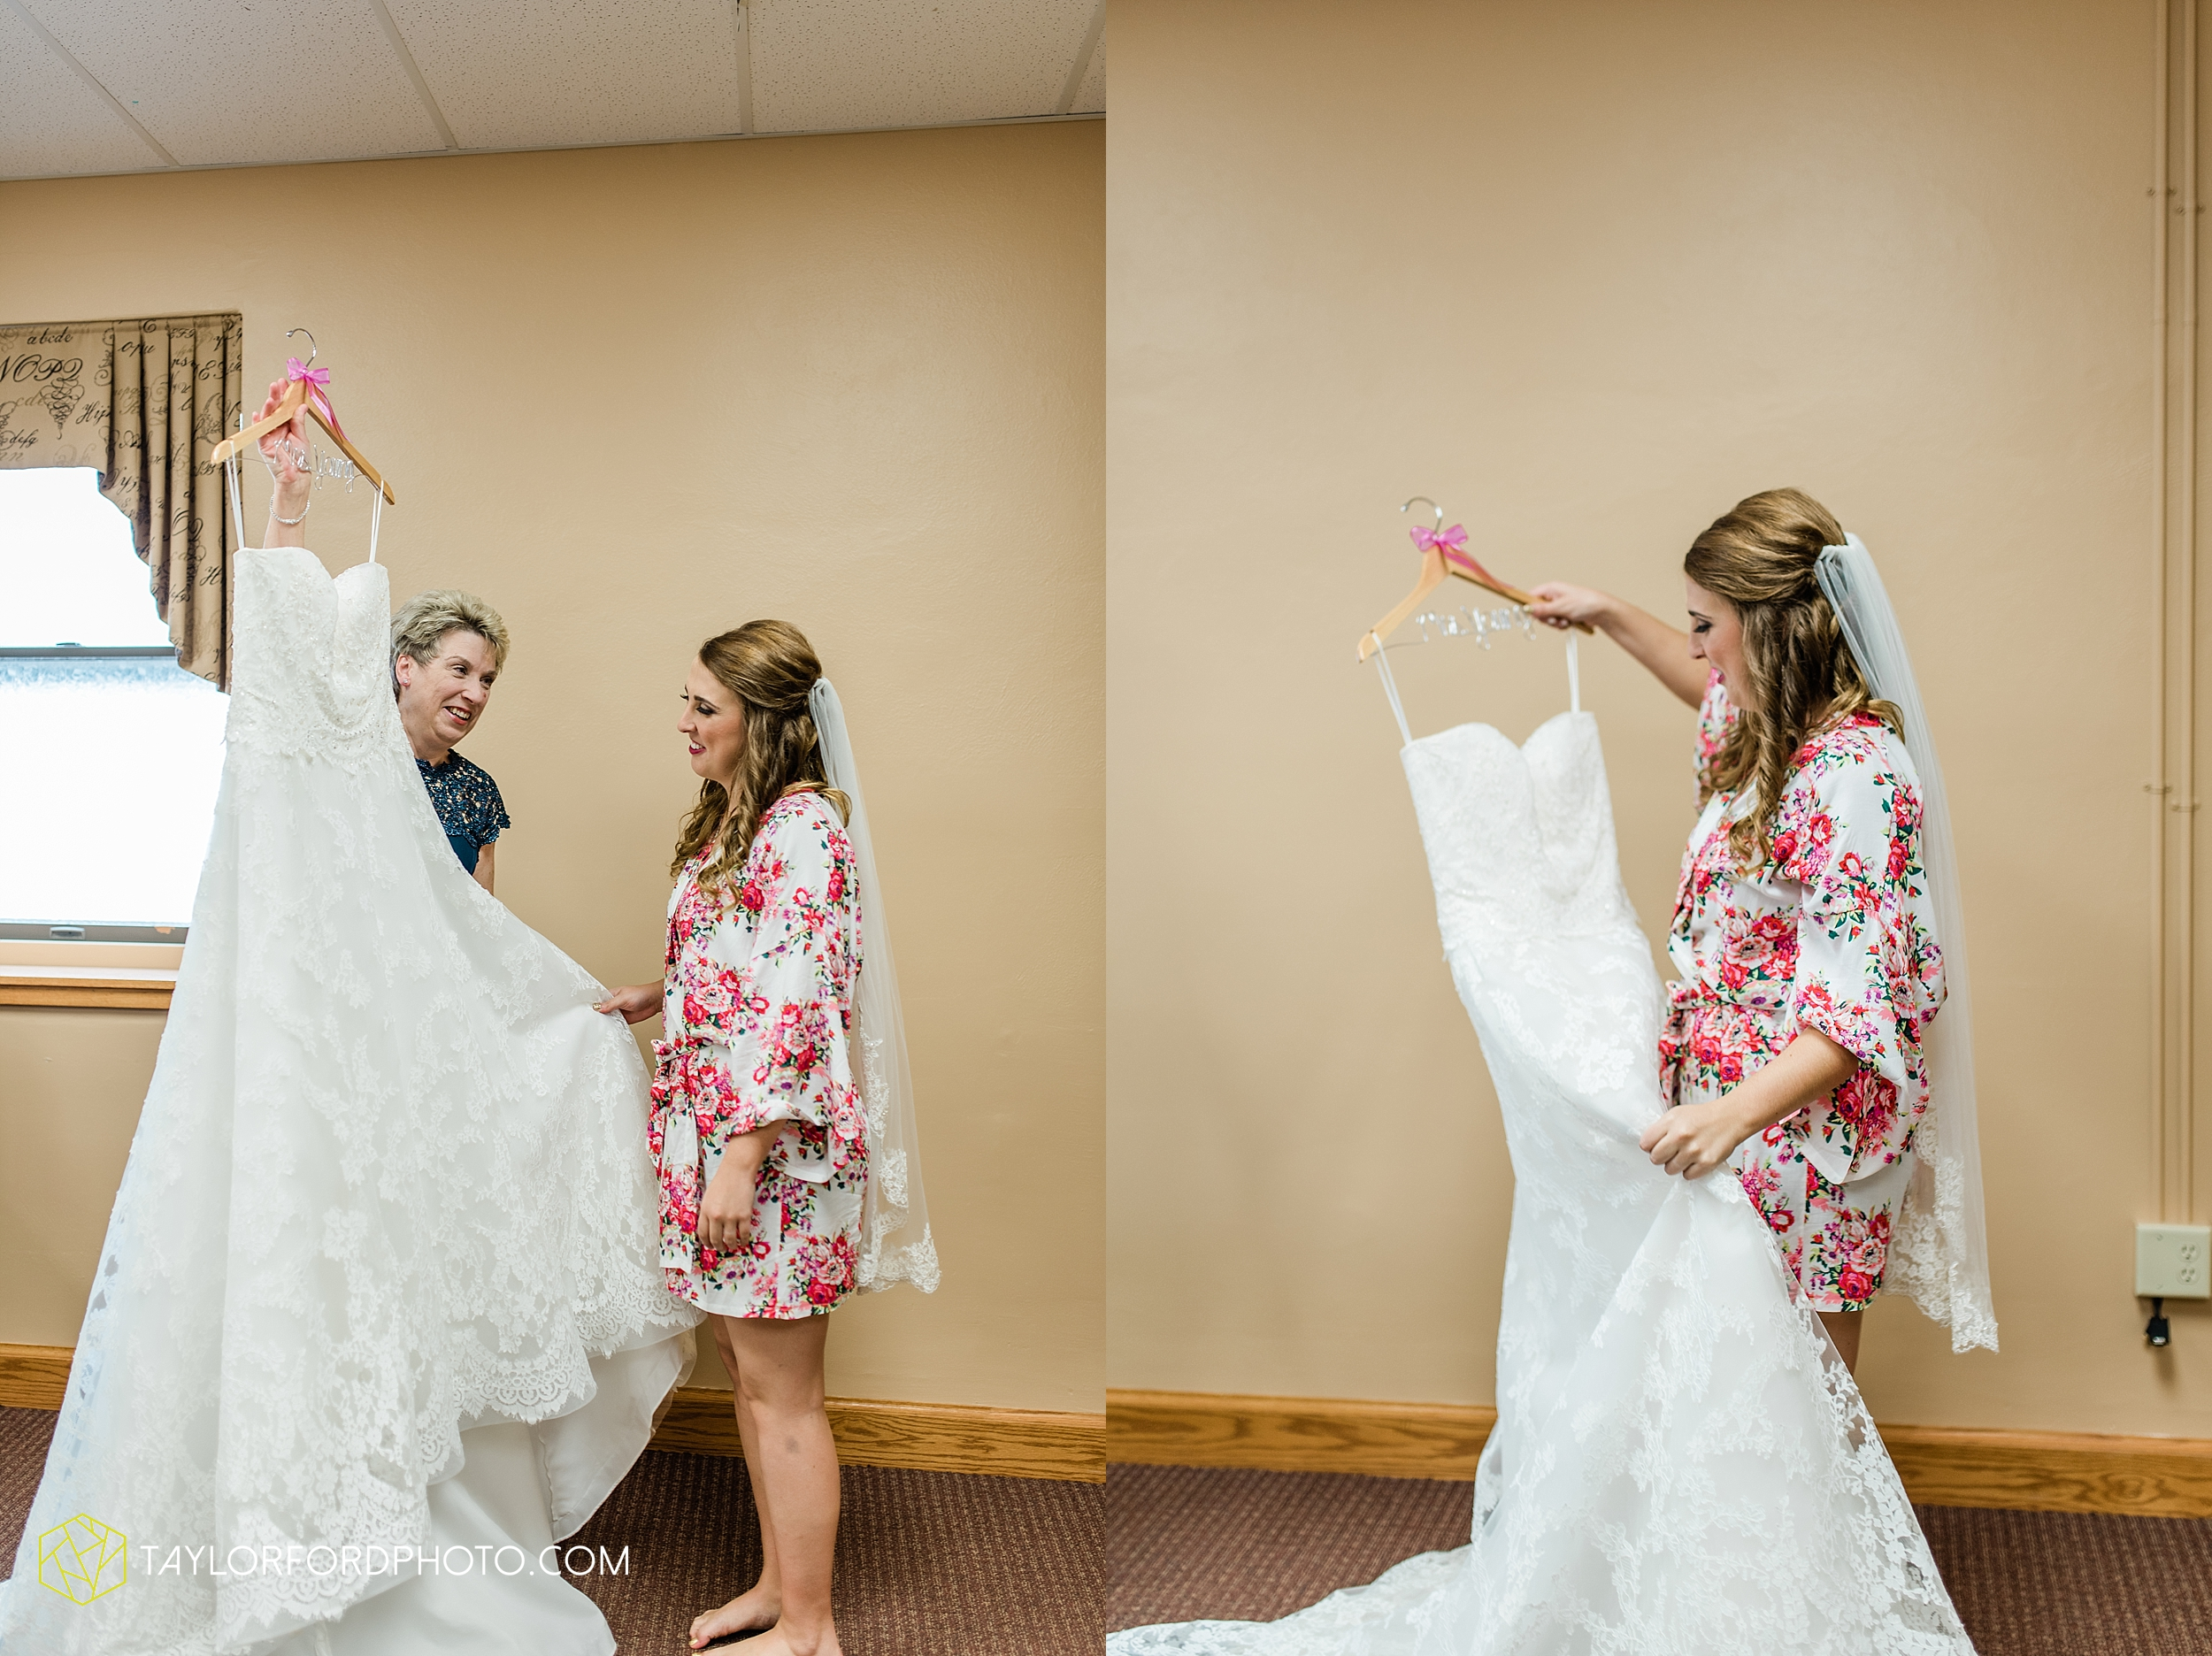 chelsey-zosh-jackson-young-first-united-methodist-church-senior-center-van-wert-ohio-wedding-photographer-taylor-ford-photography_0052.jpg